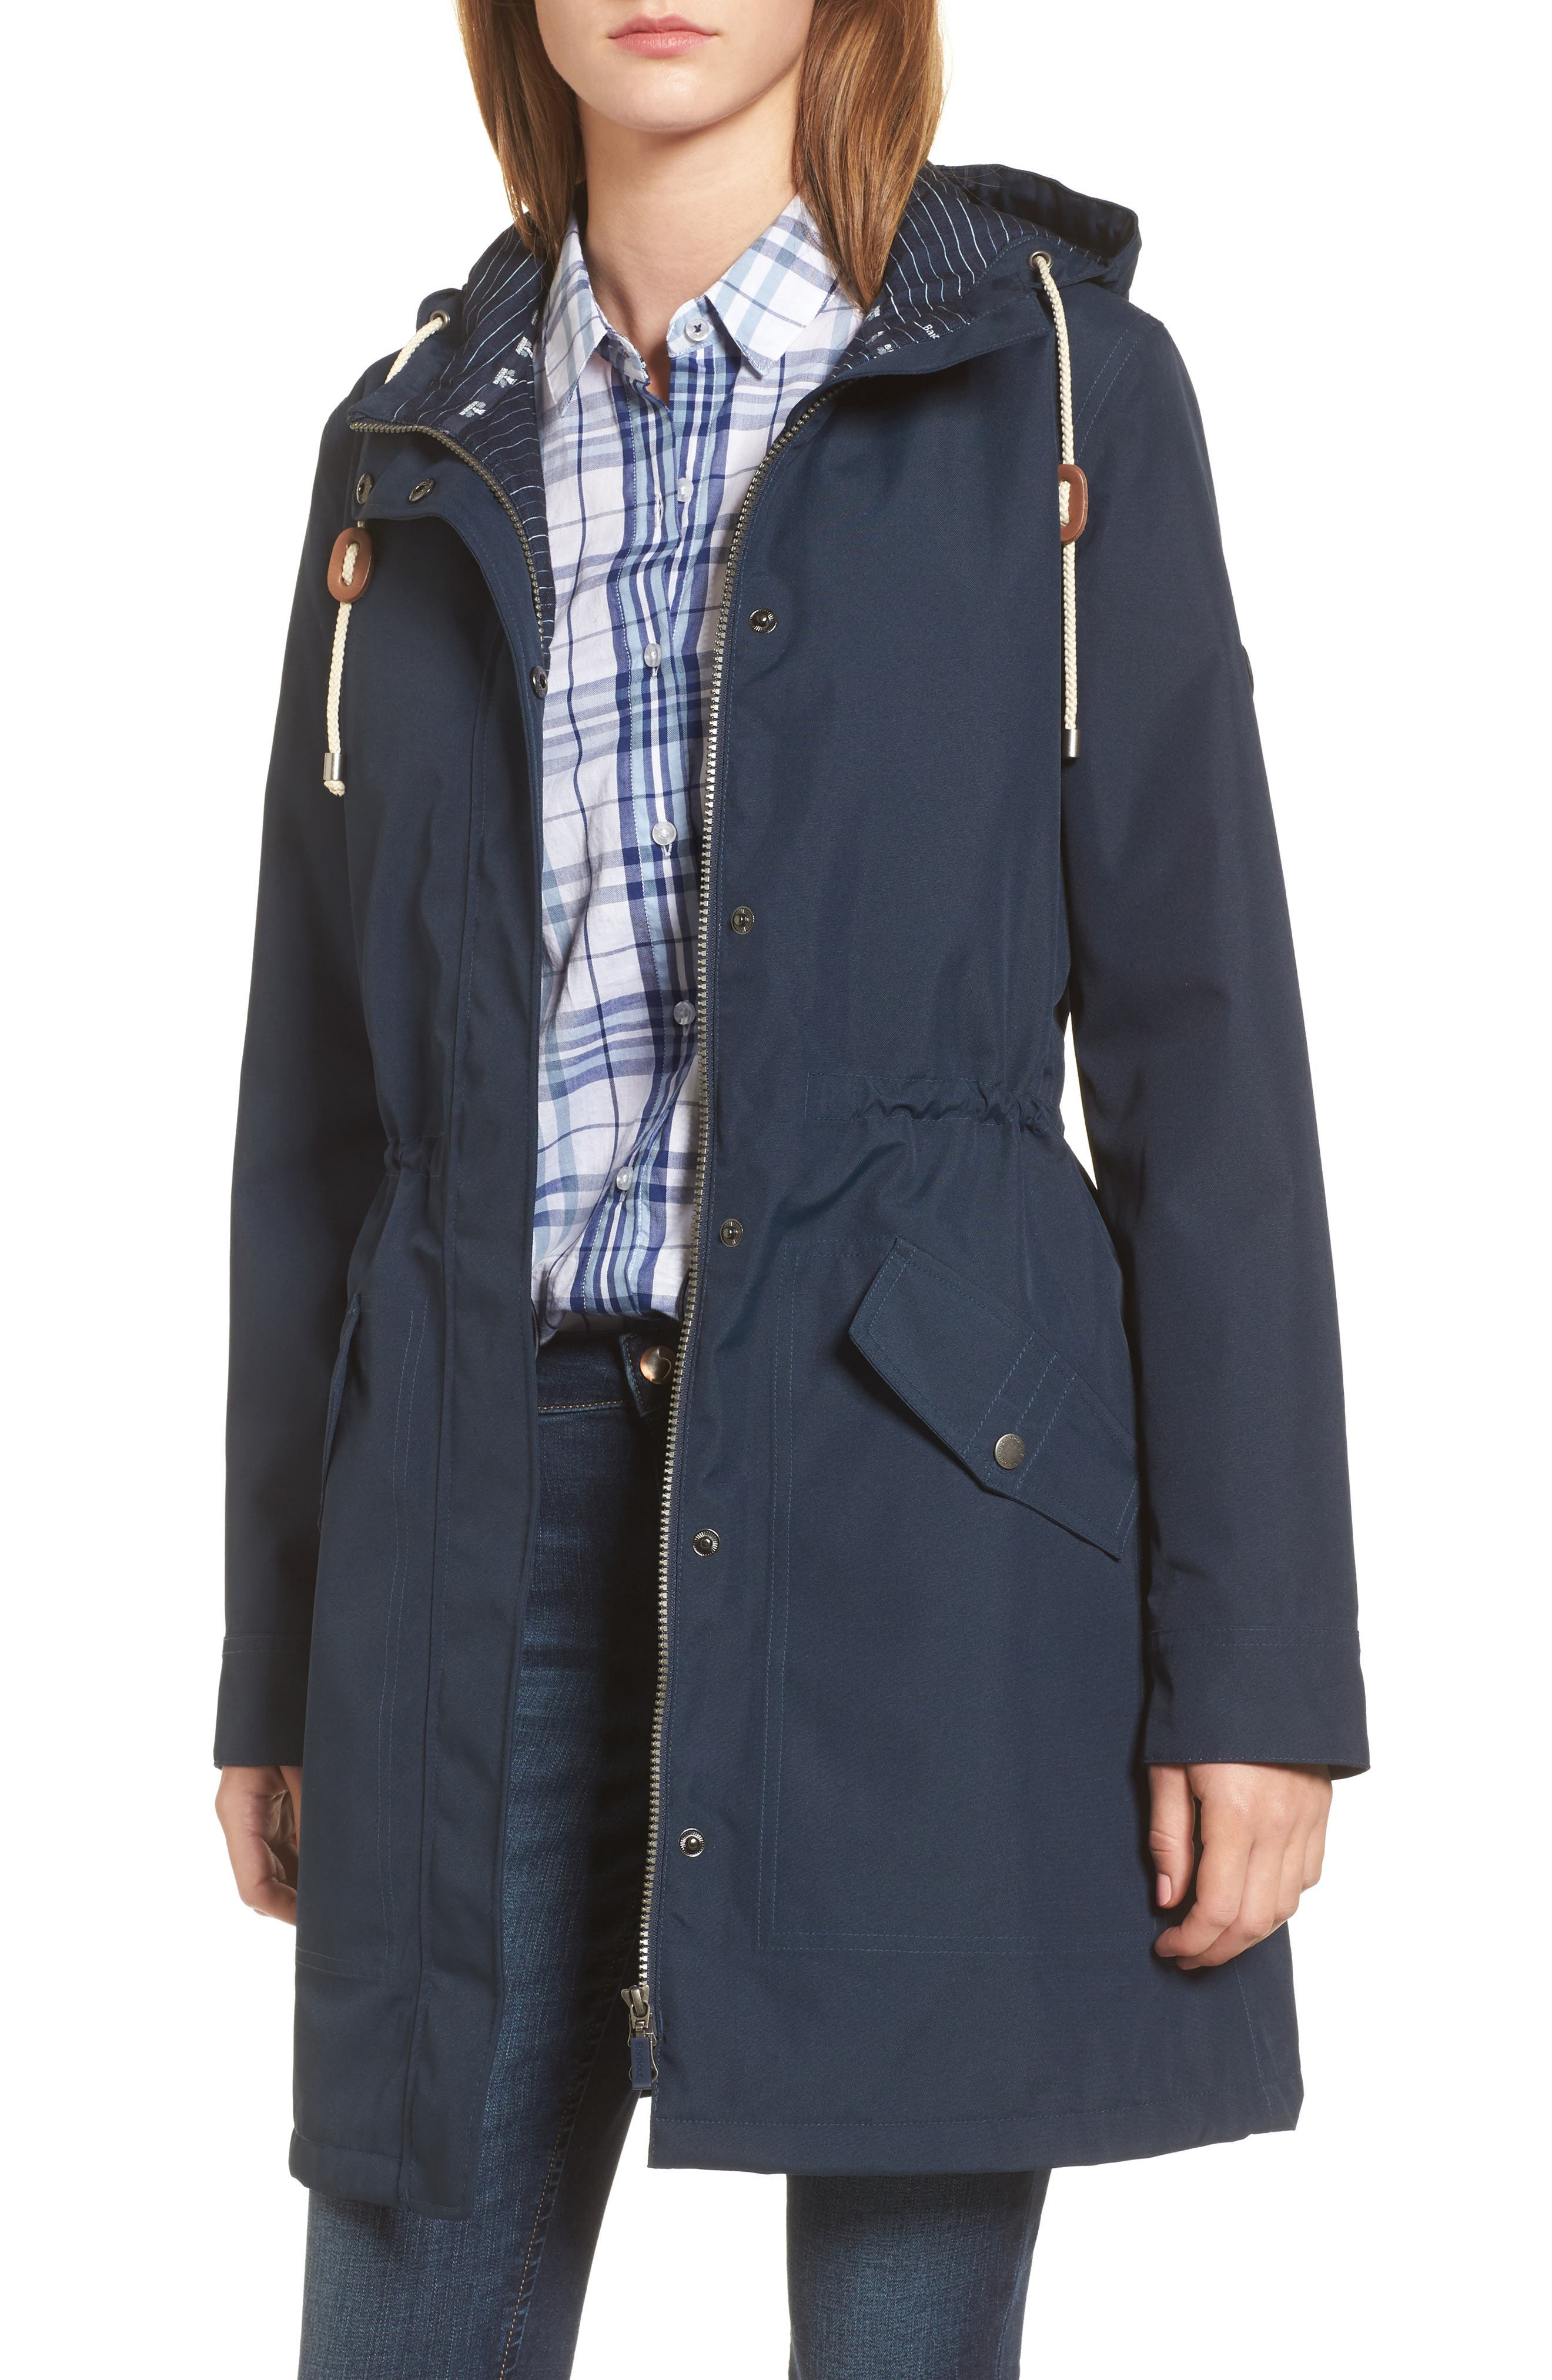 Whitford Anorak Jacket,                             Main thumbnail 1, color,                             Navy